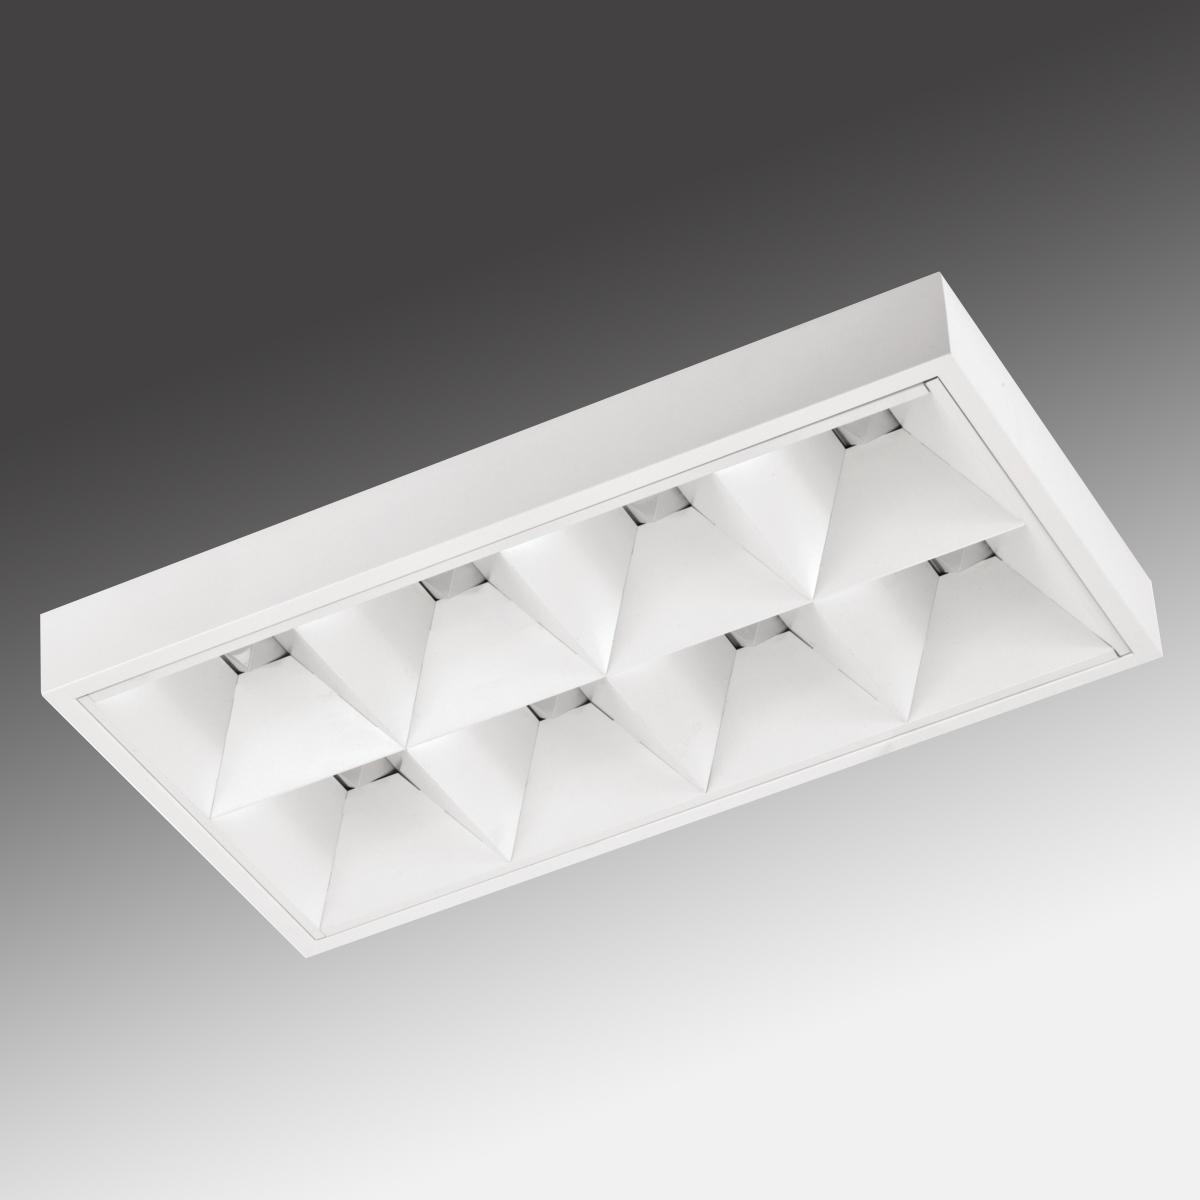 1 Stk SALENA LED 39W 4050lm/840 SLB EVG IP20 weiß LIG6100139